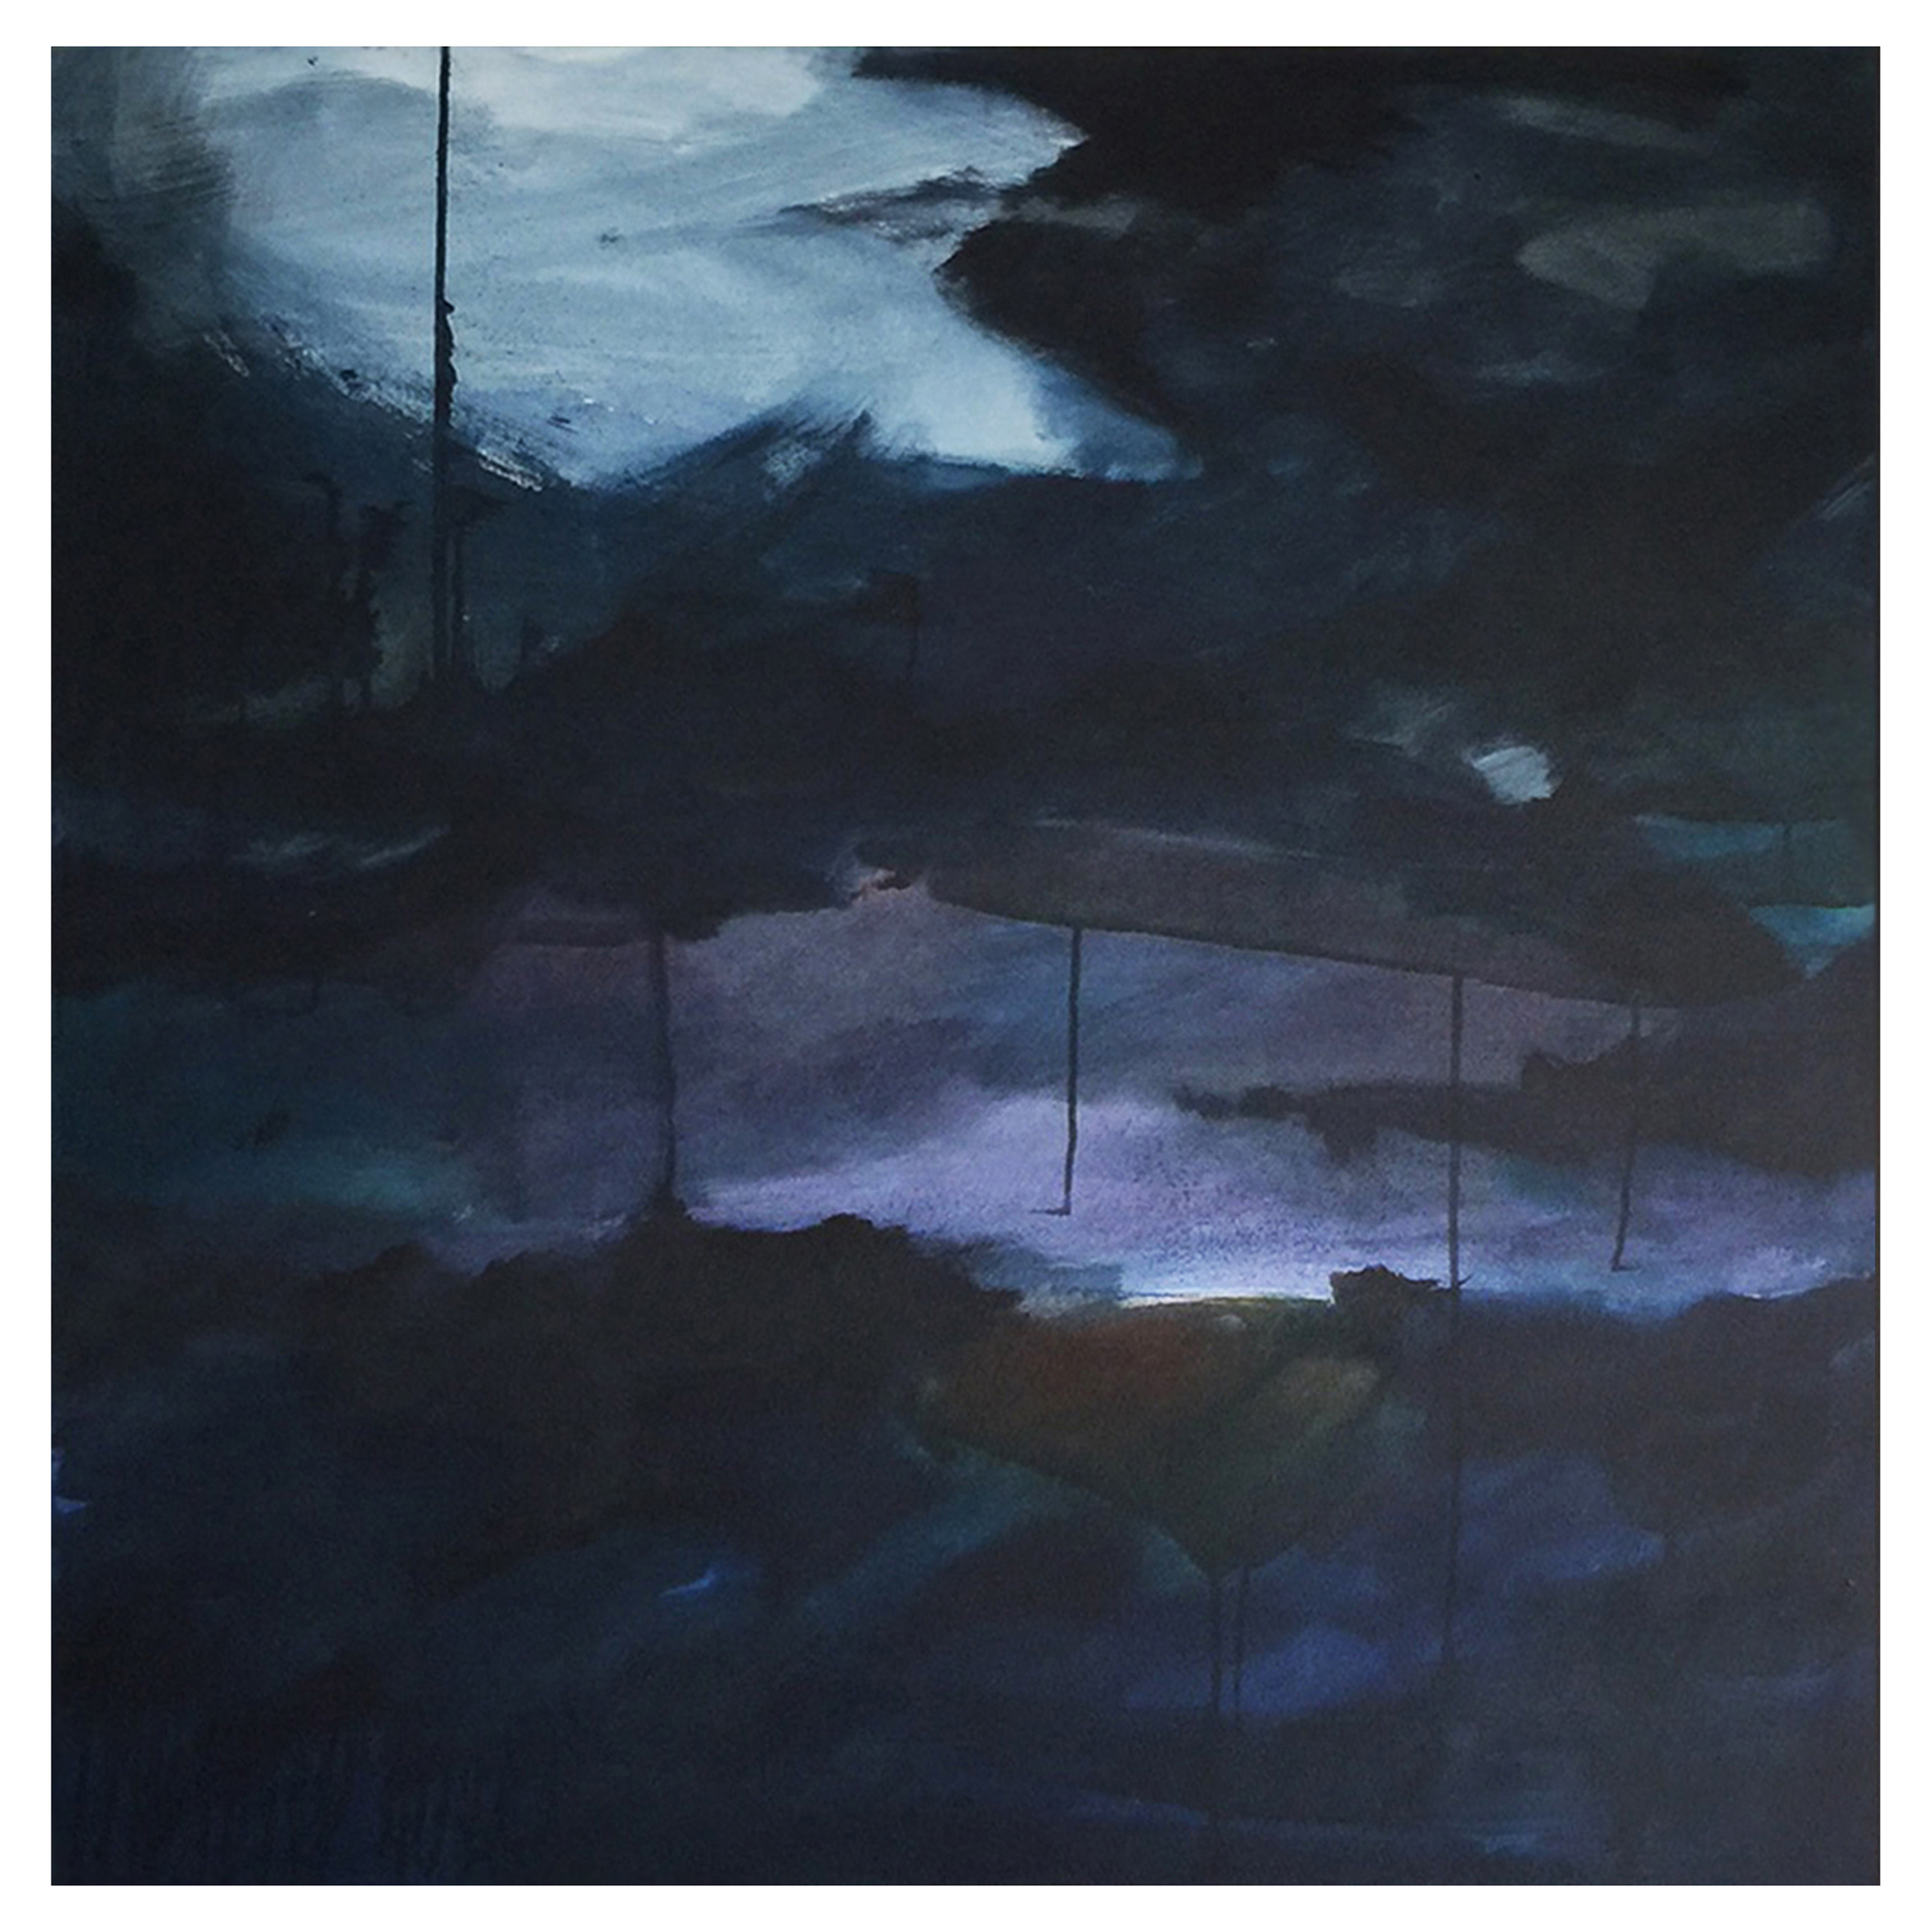 stefan-gevers_midnight_2017_Acrylic on canvas_2017_h95xw95cm.jpeg